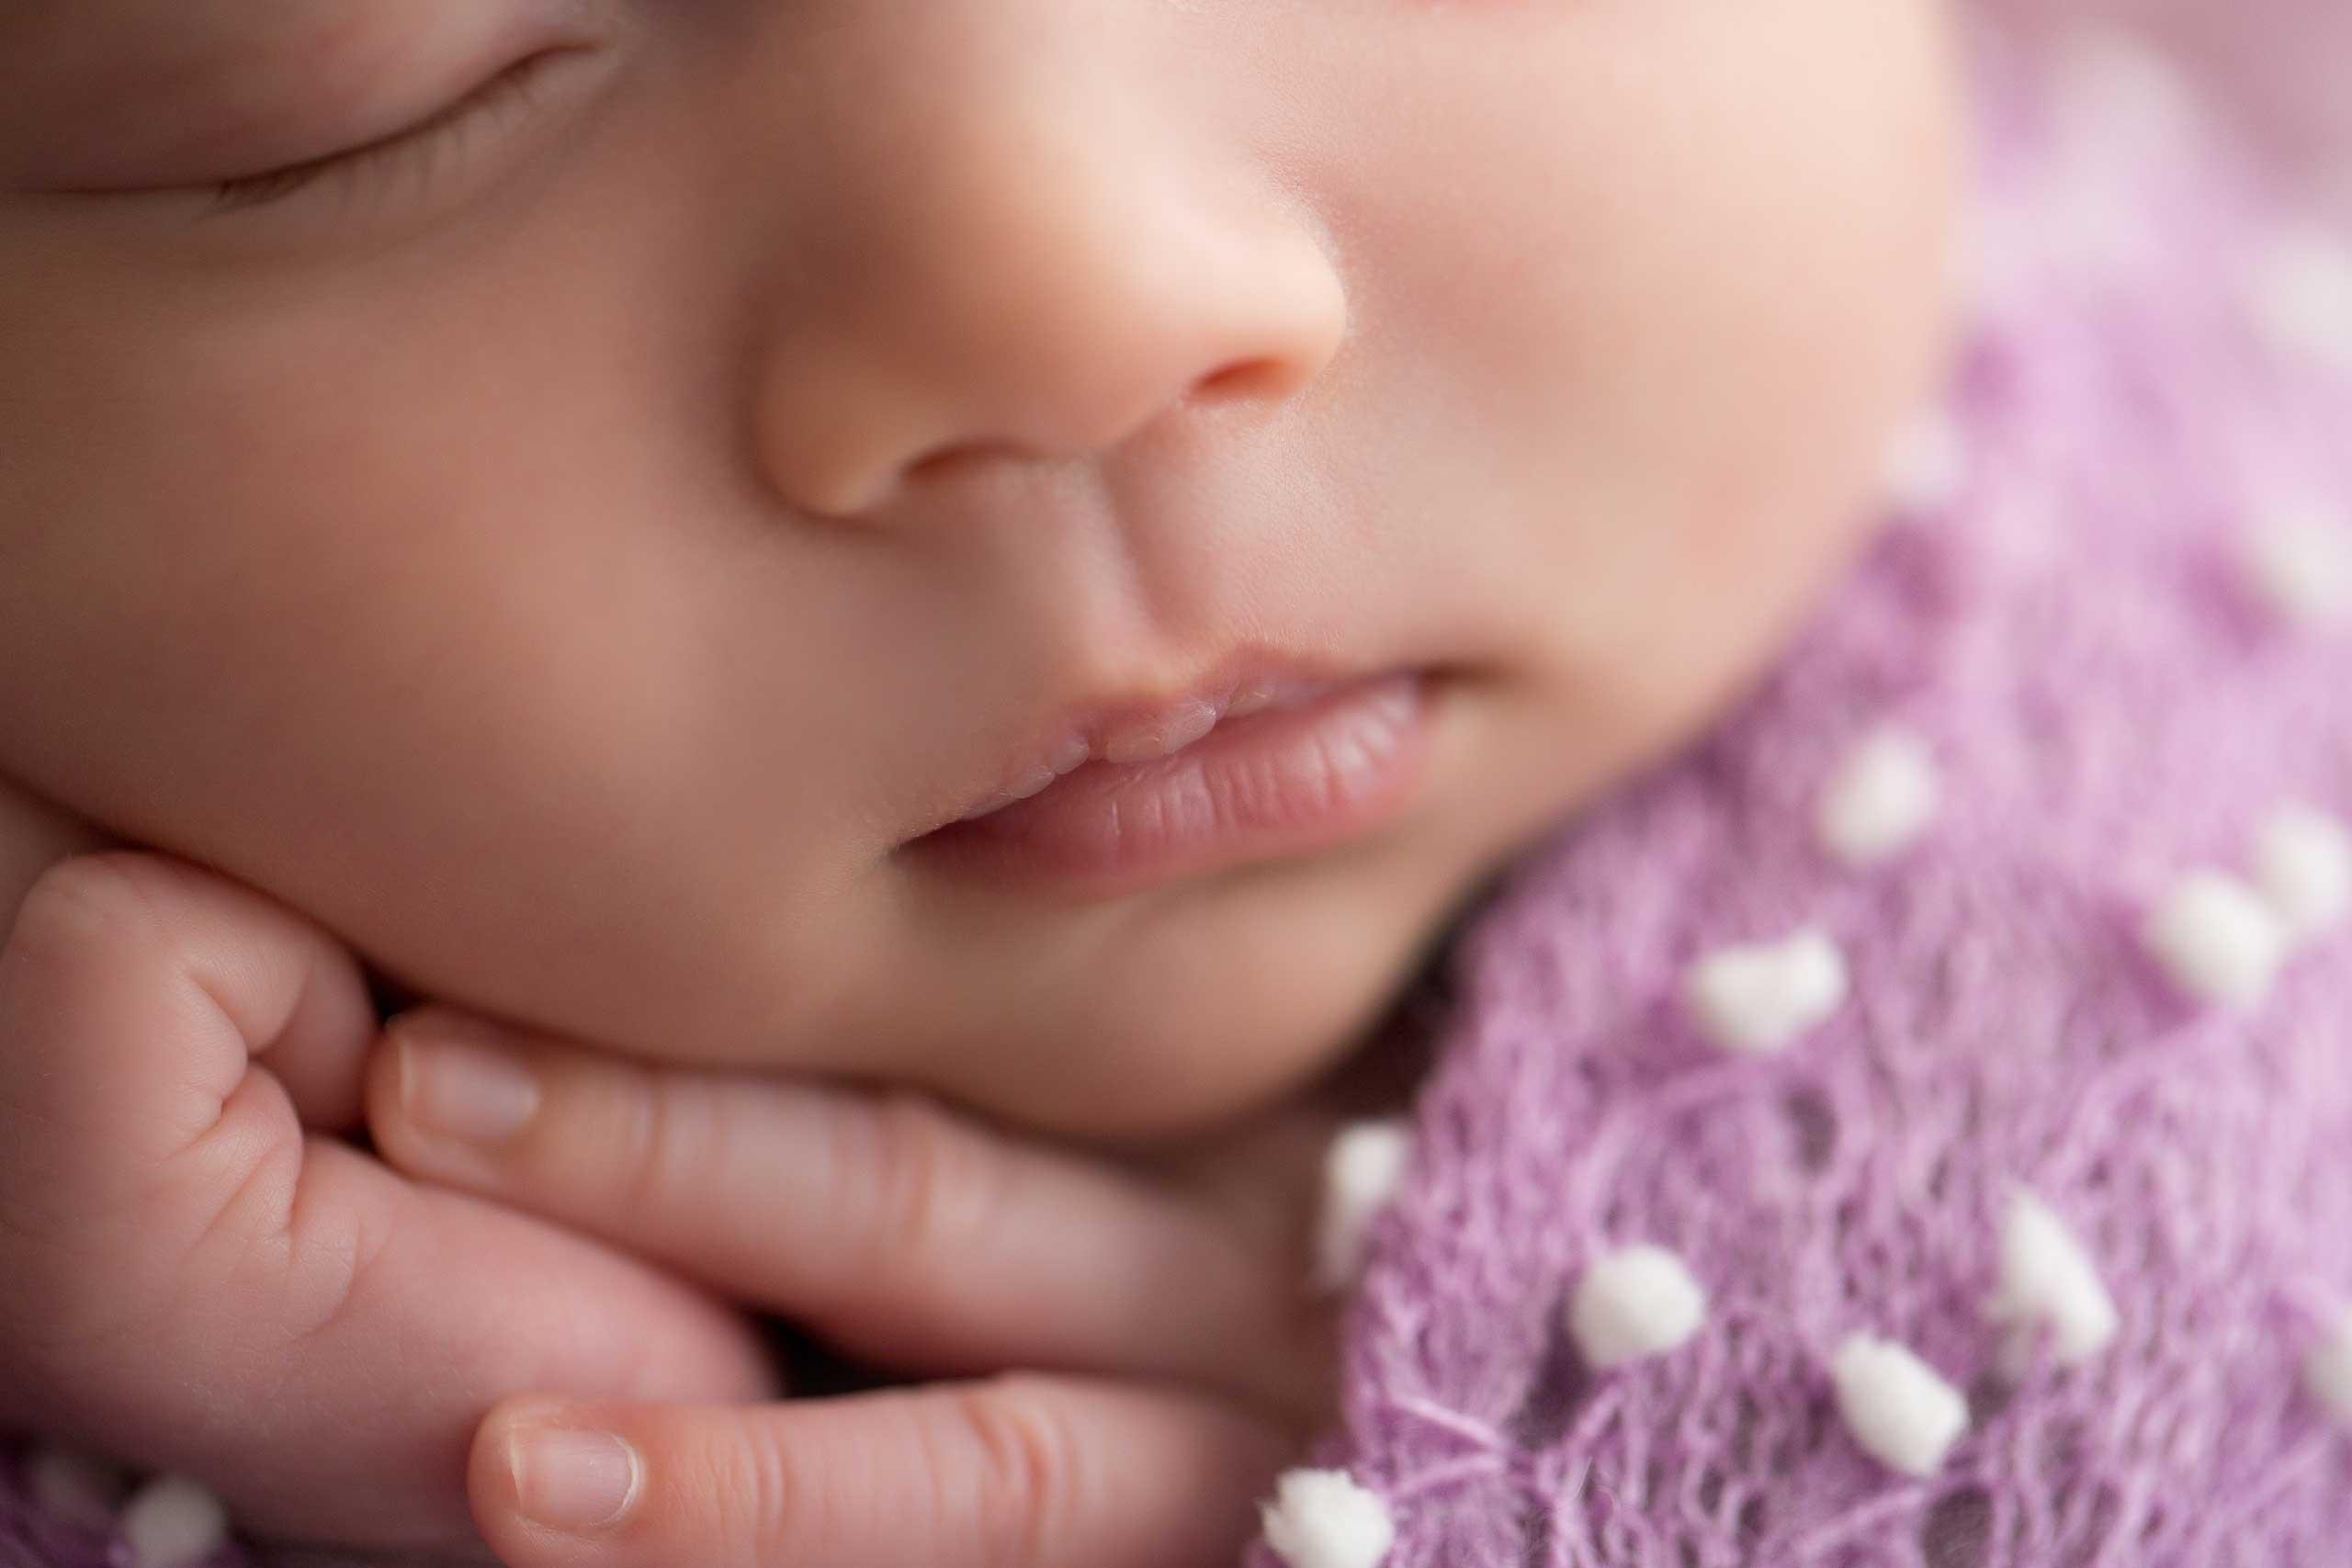 Ramina Magid Newborn Photography Los Angeles 23812